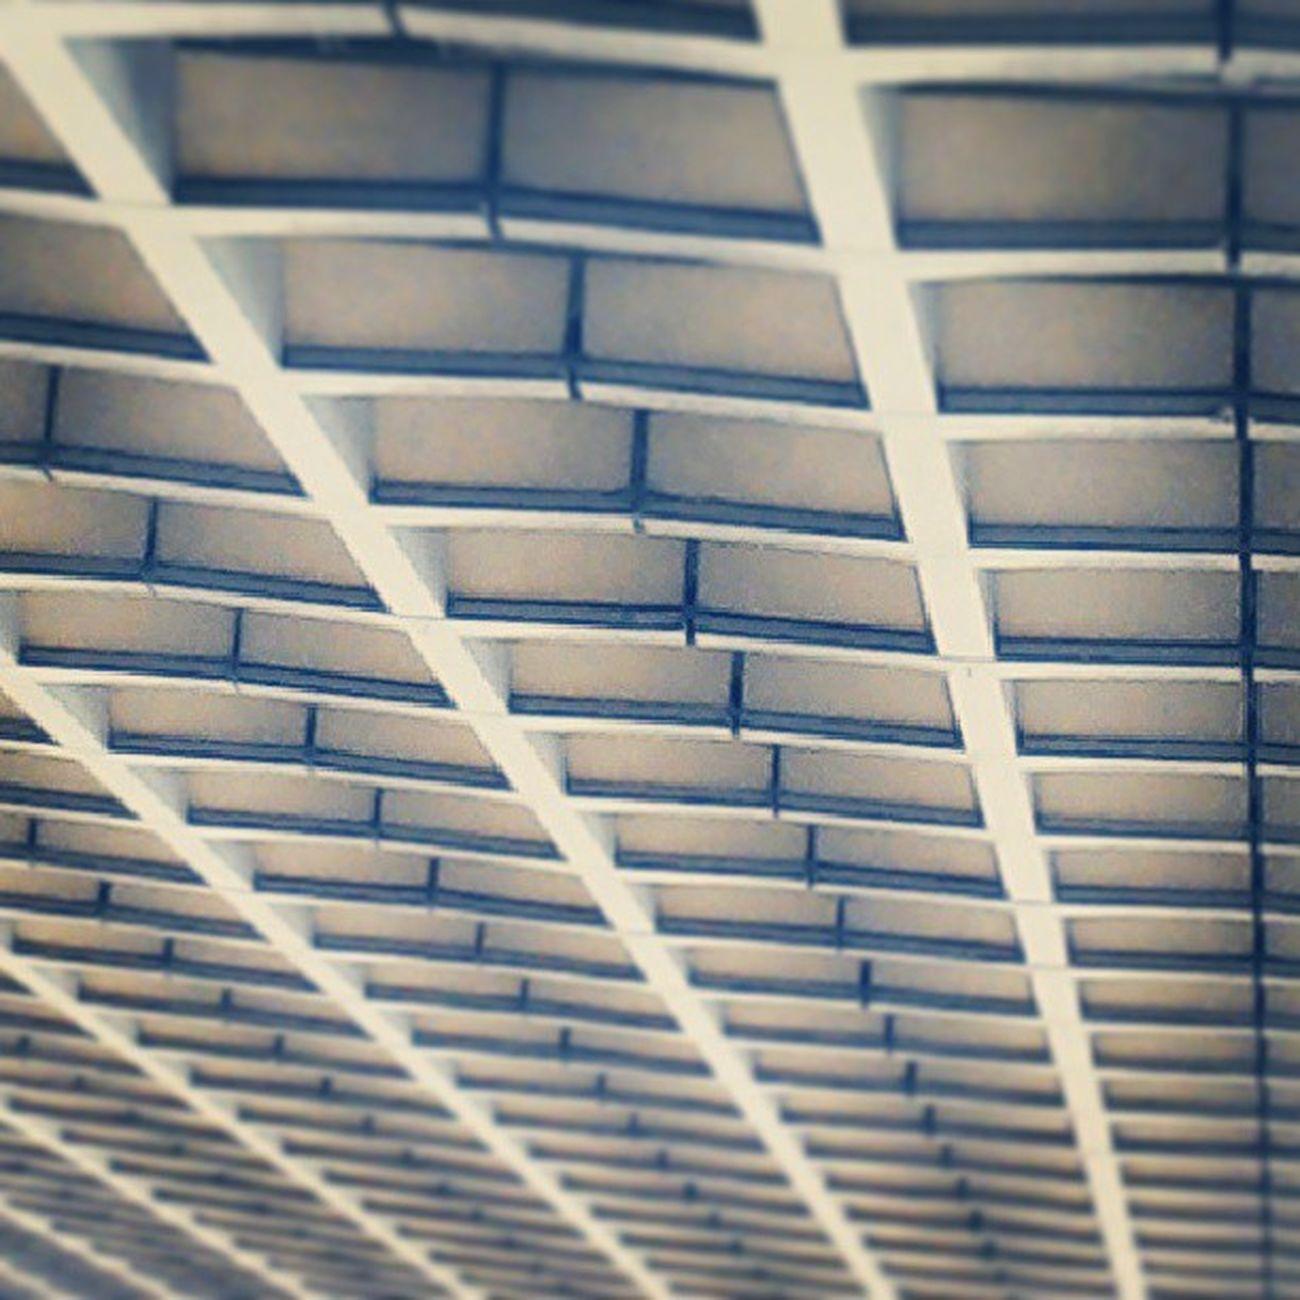 Centerpoint London Town Techno architecture